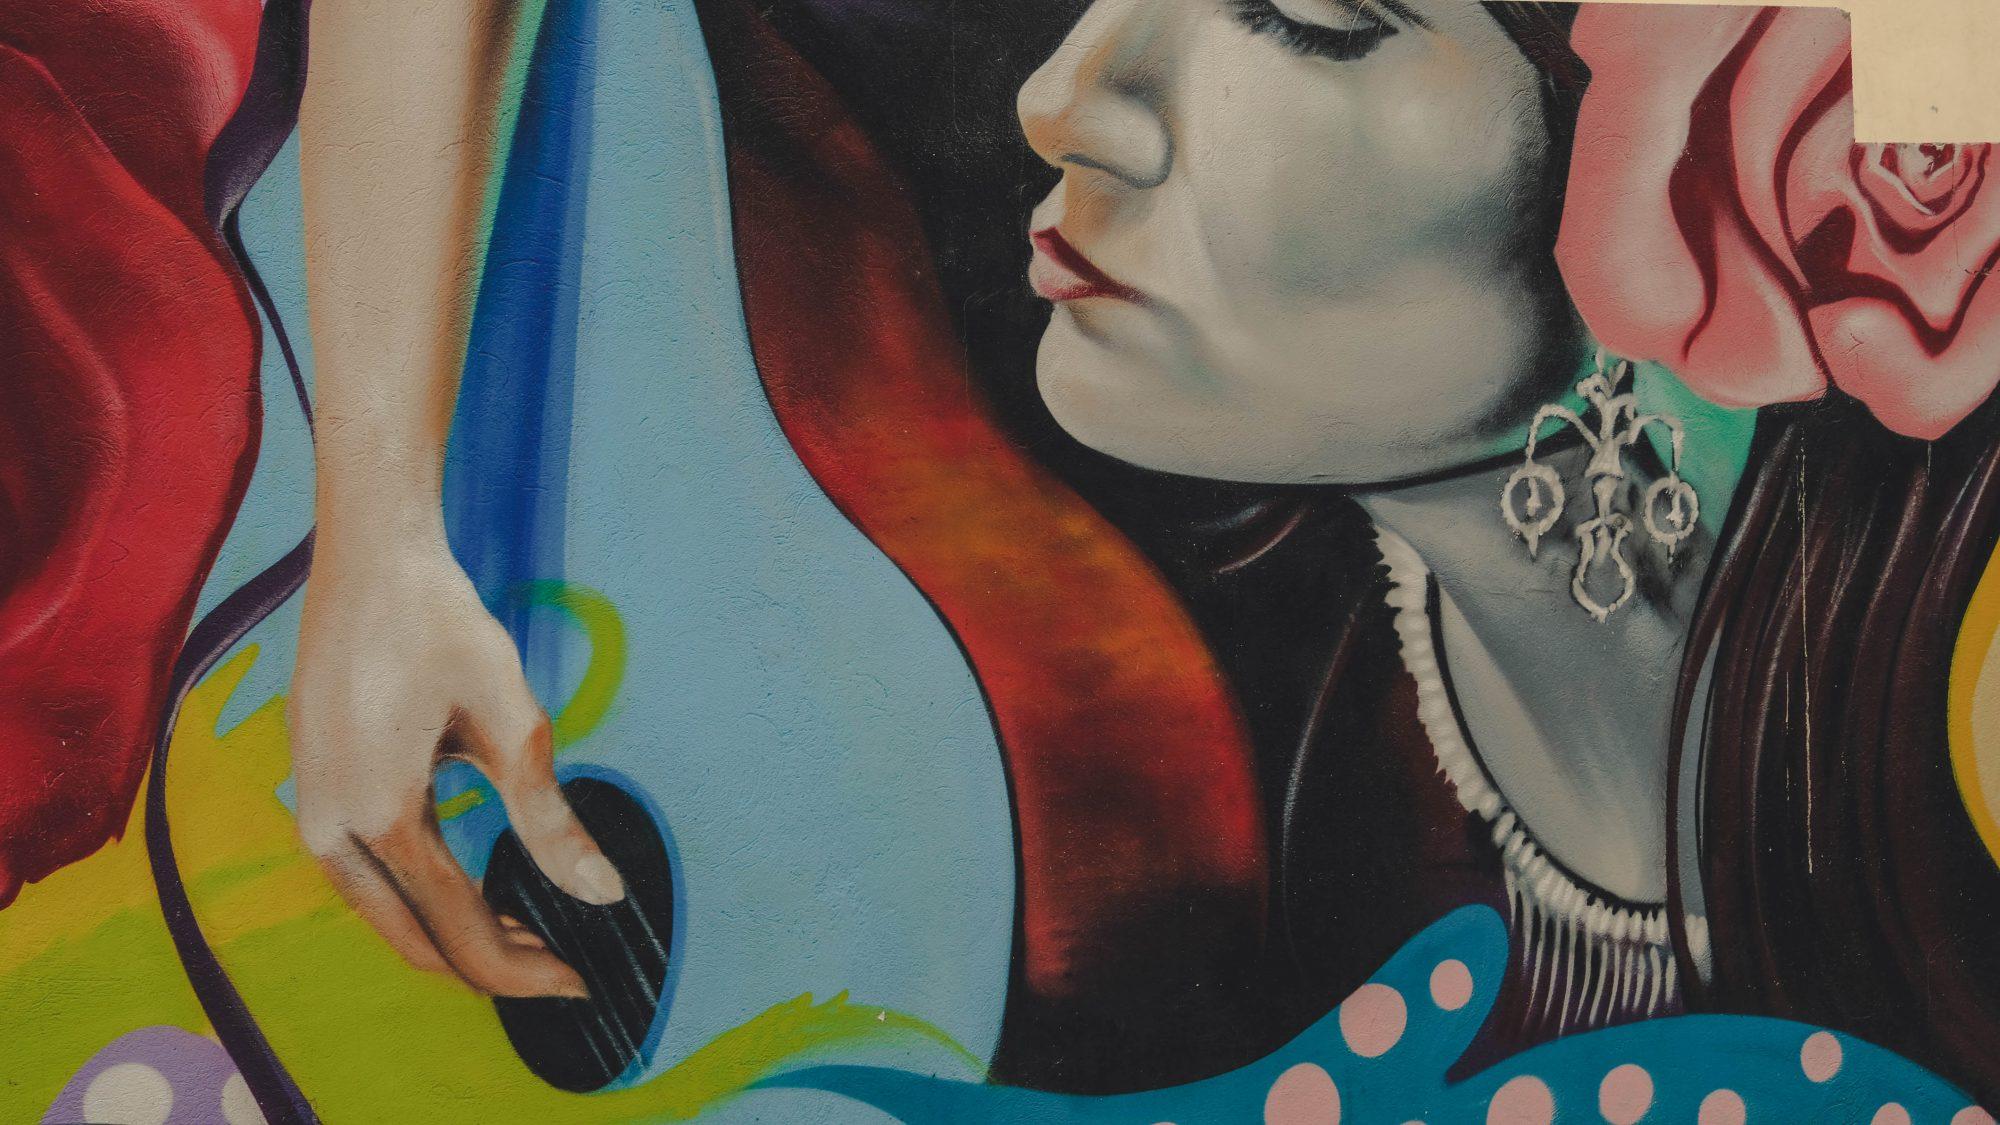 Joueuse de flamenco - Malaga, Espagne